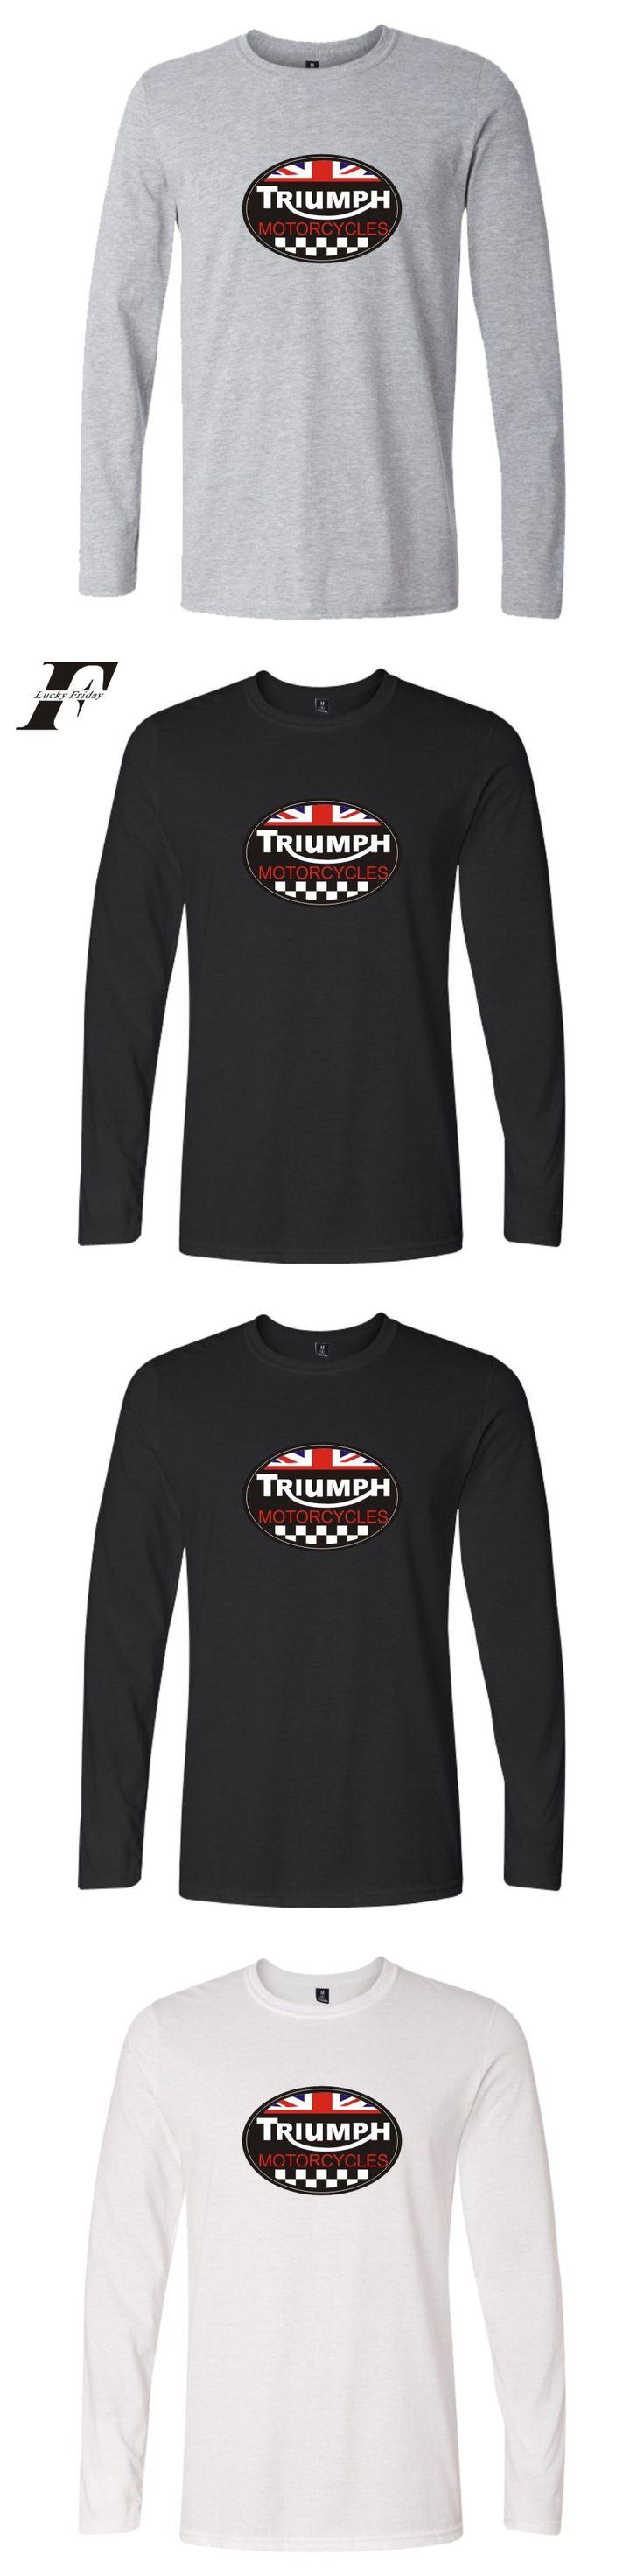 LUCKYFRIDAYF 2017 TRIUMPH MOTORCYCLE Autumn Summer Long Sleeve Casual Cotton Men/Women Hip hop T Shirt Clothes Plus Size 4XL